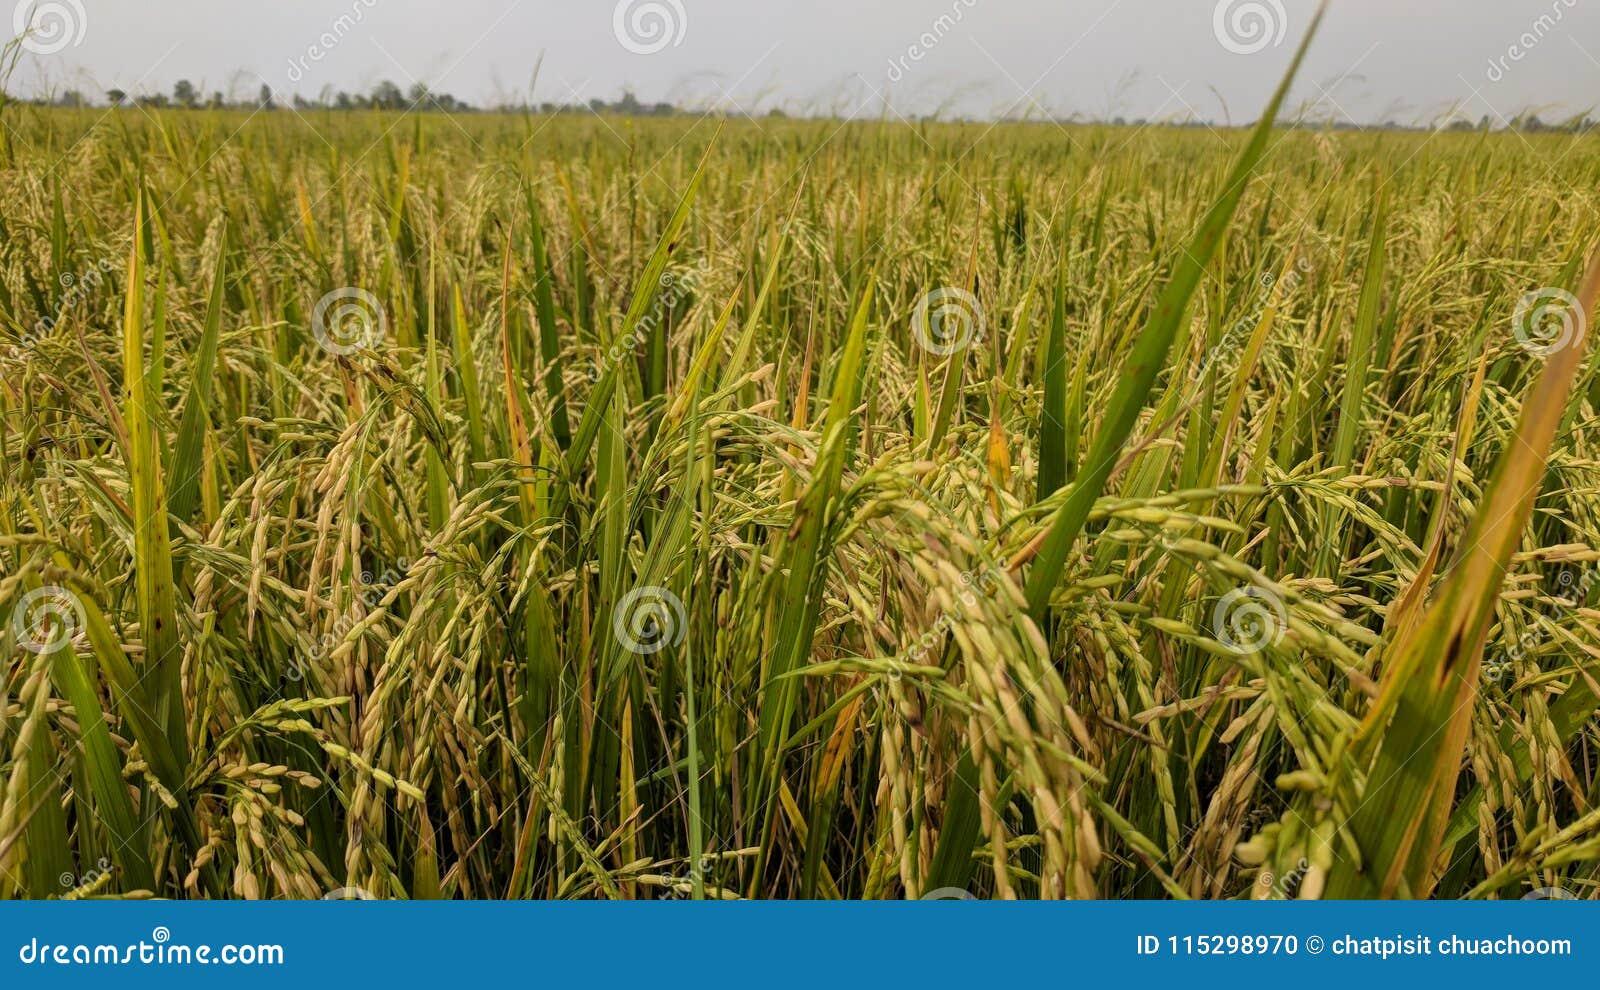 golden grain and golden rice in my farm